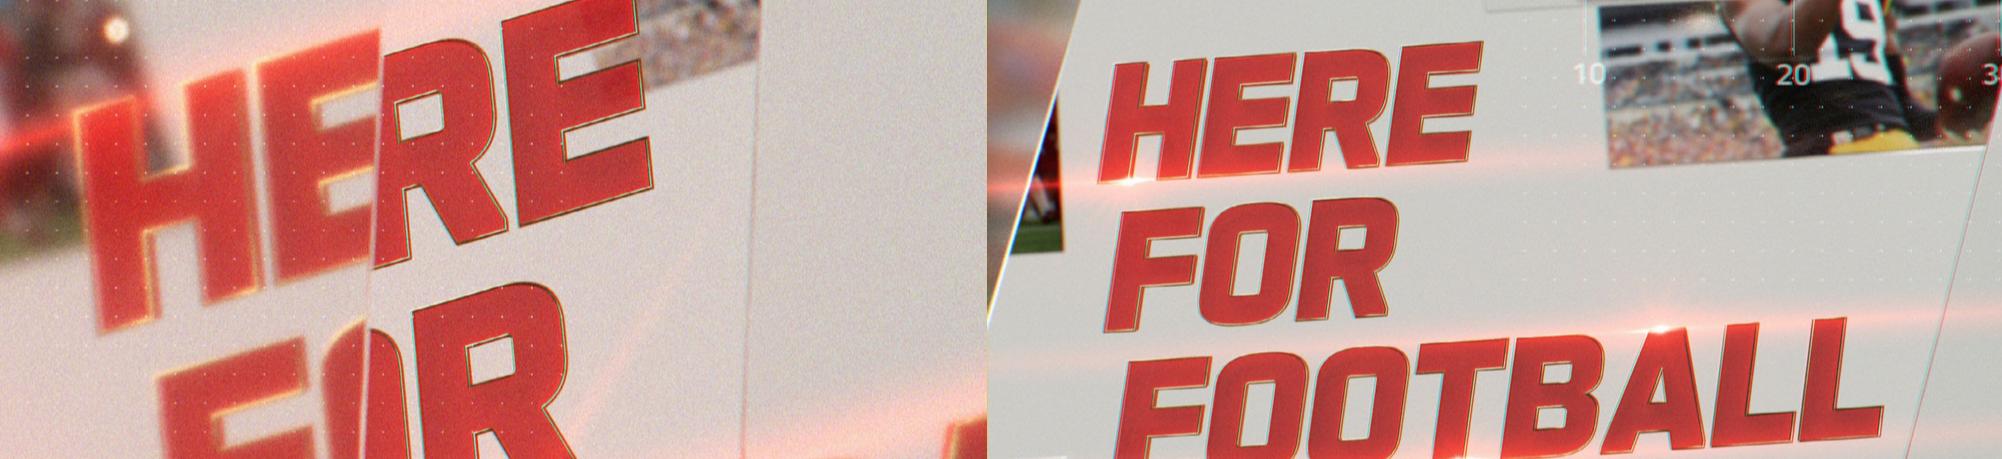 HFFB Banner Red